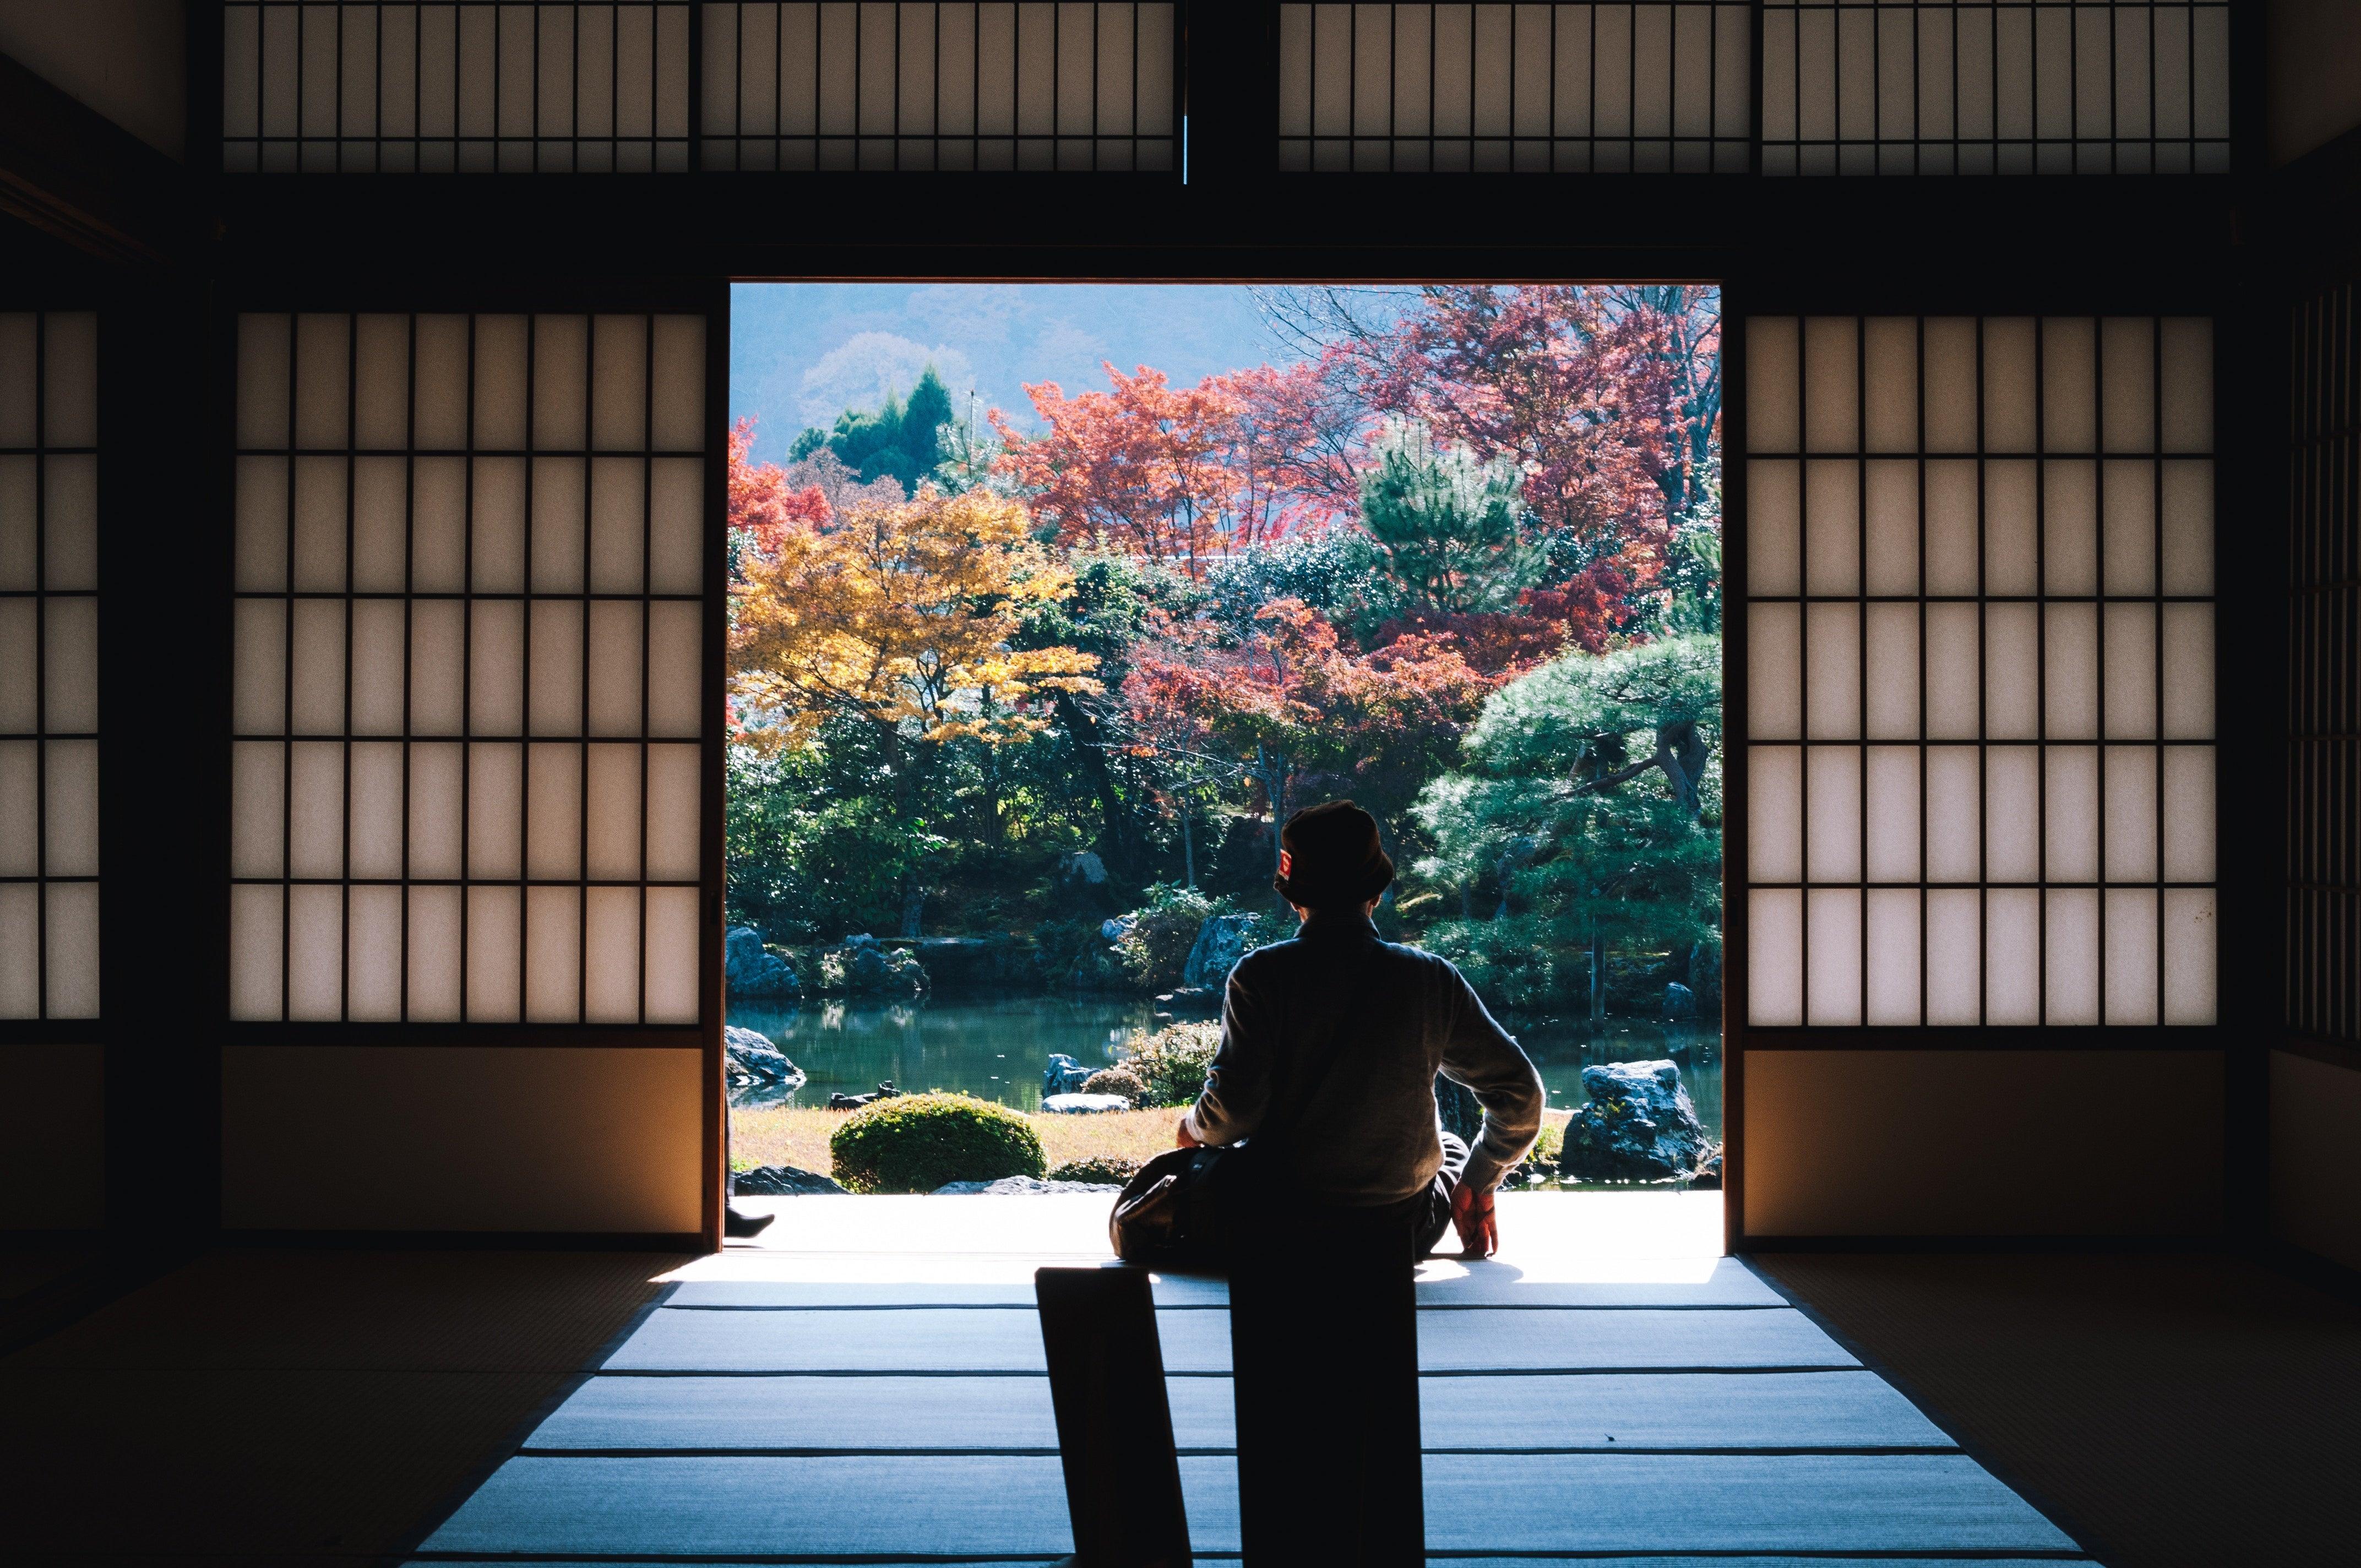 08_meditate_photo_by_MasaakiKomori_photo_via_Unsplash